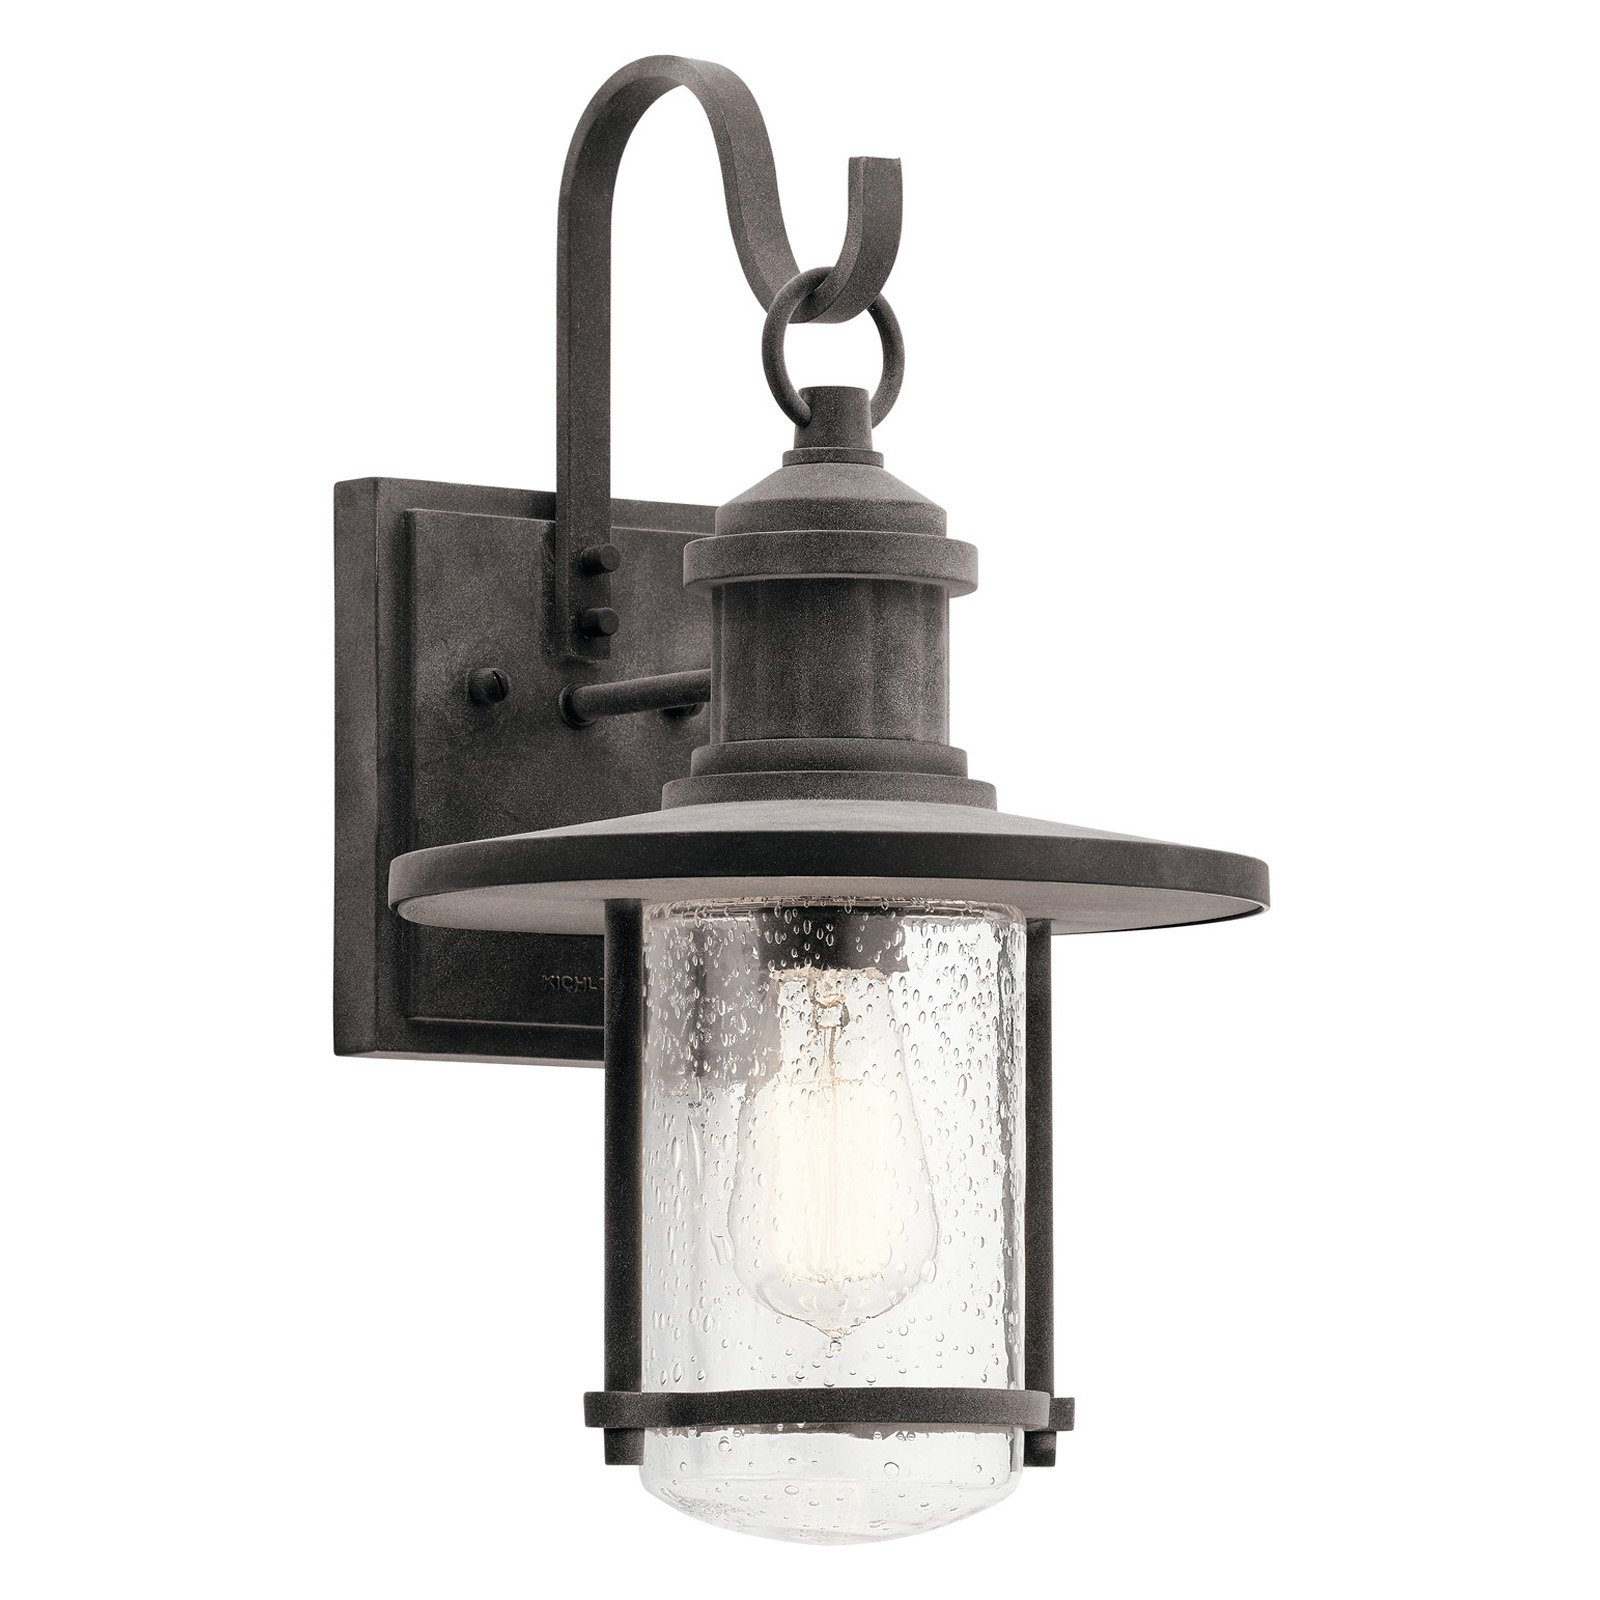 Kichler Riverwood 49193 Outdoor Wall Light